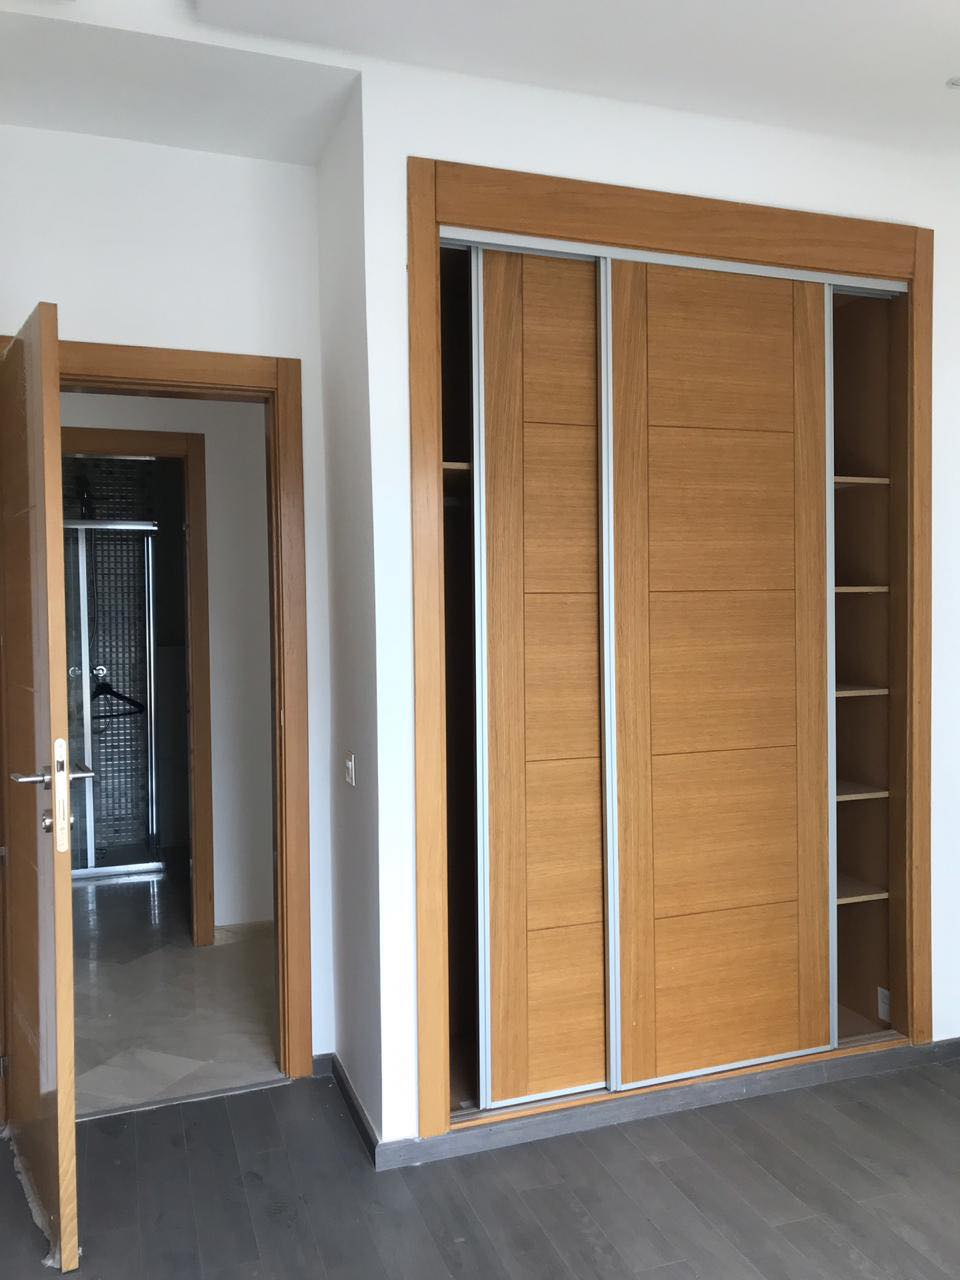 Appartement vide 200 M² à Agadir sonaba